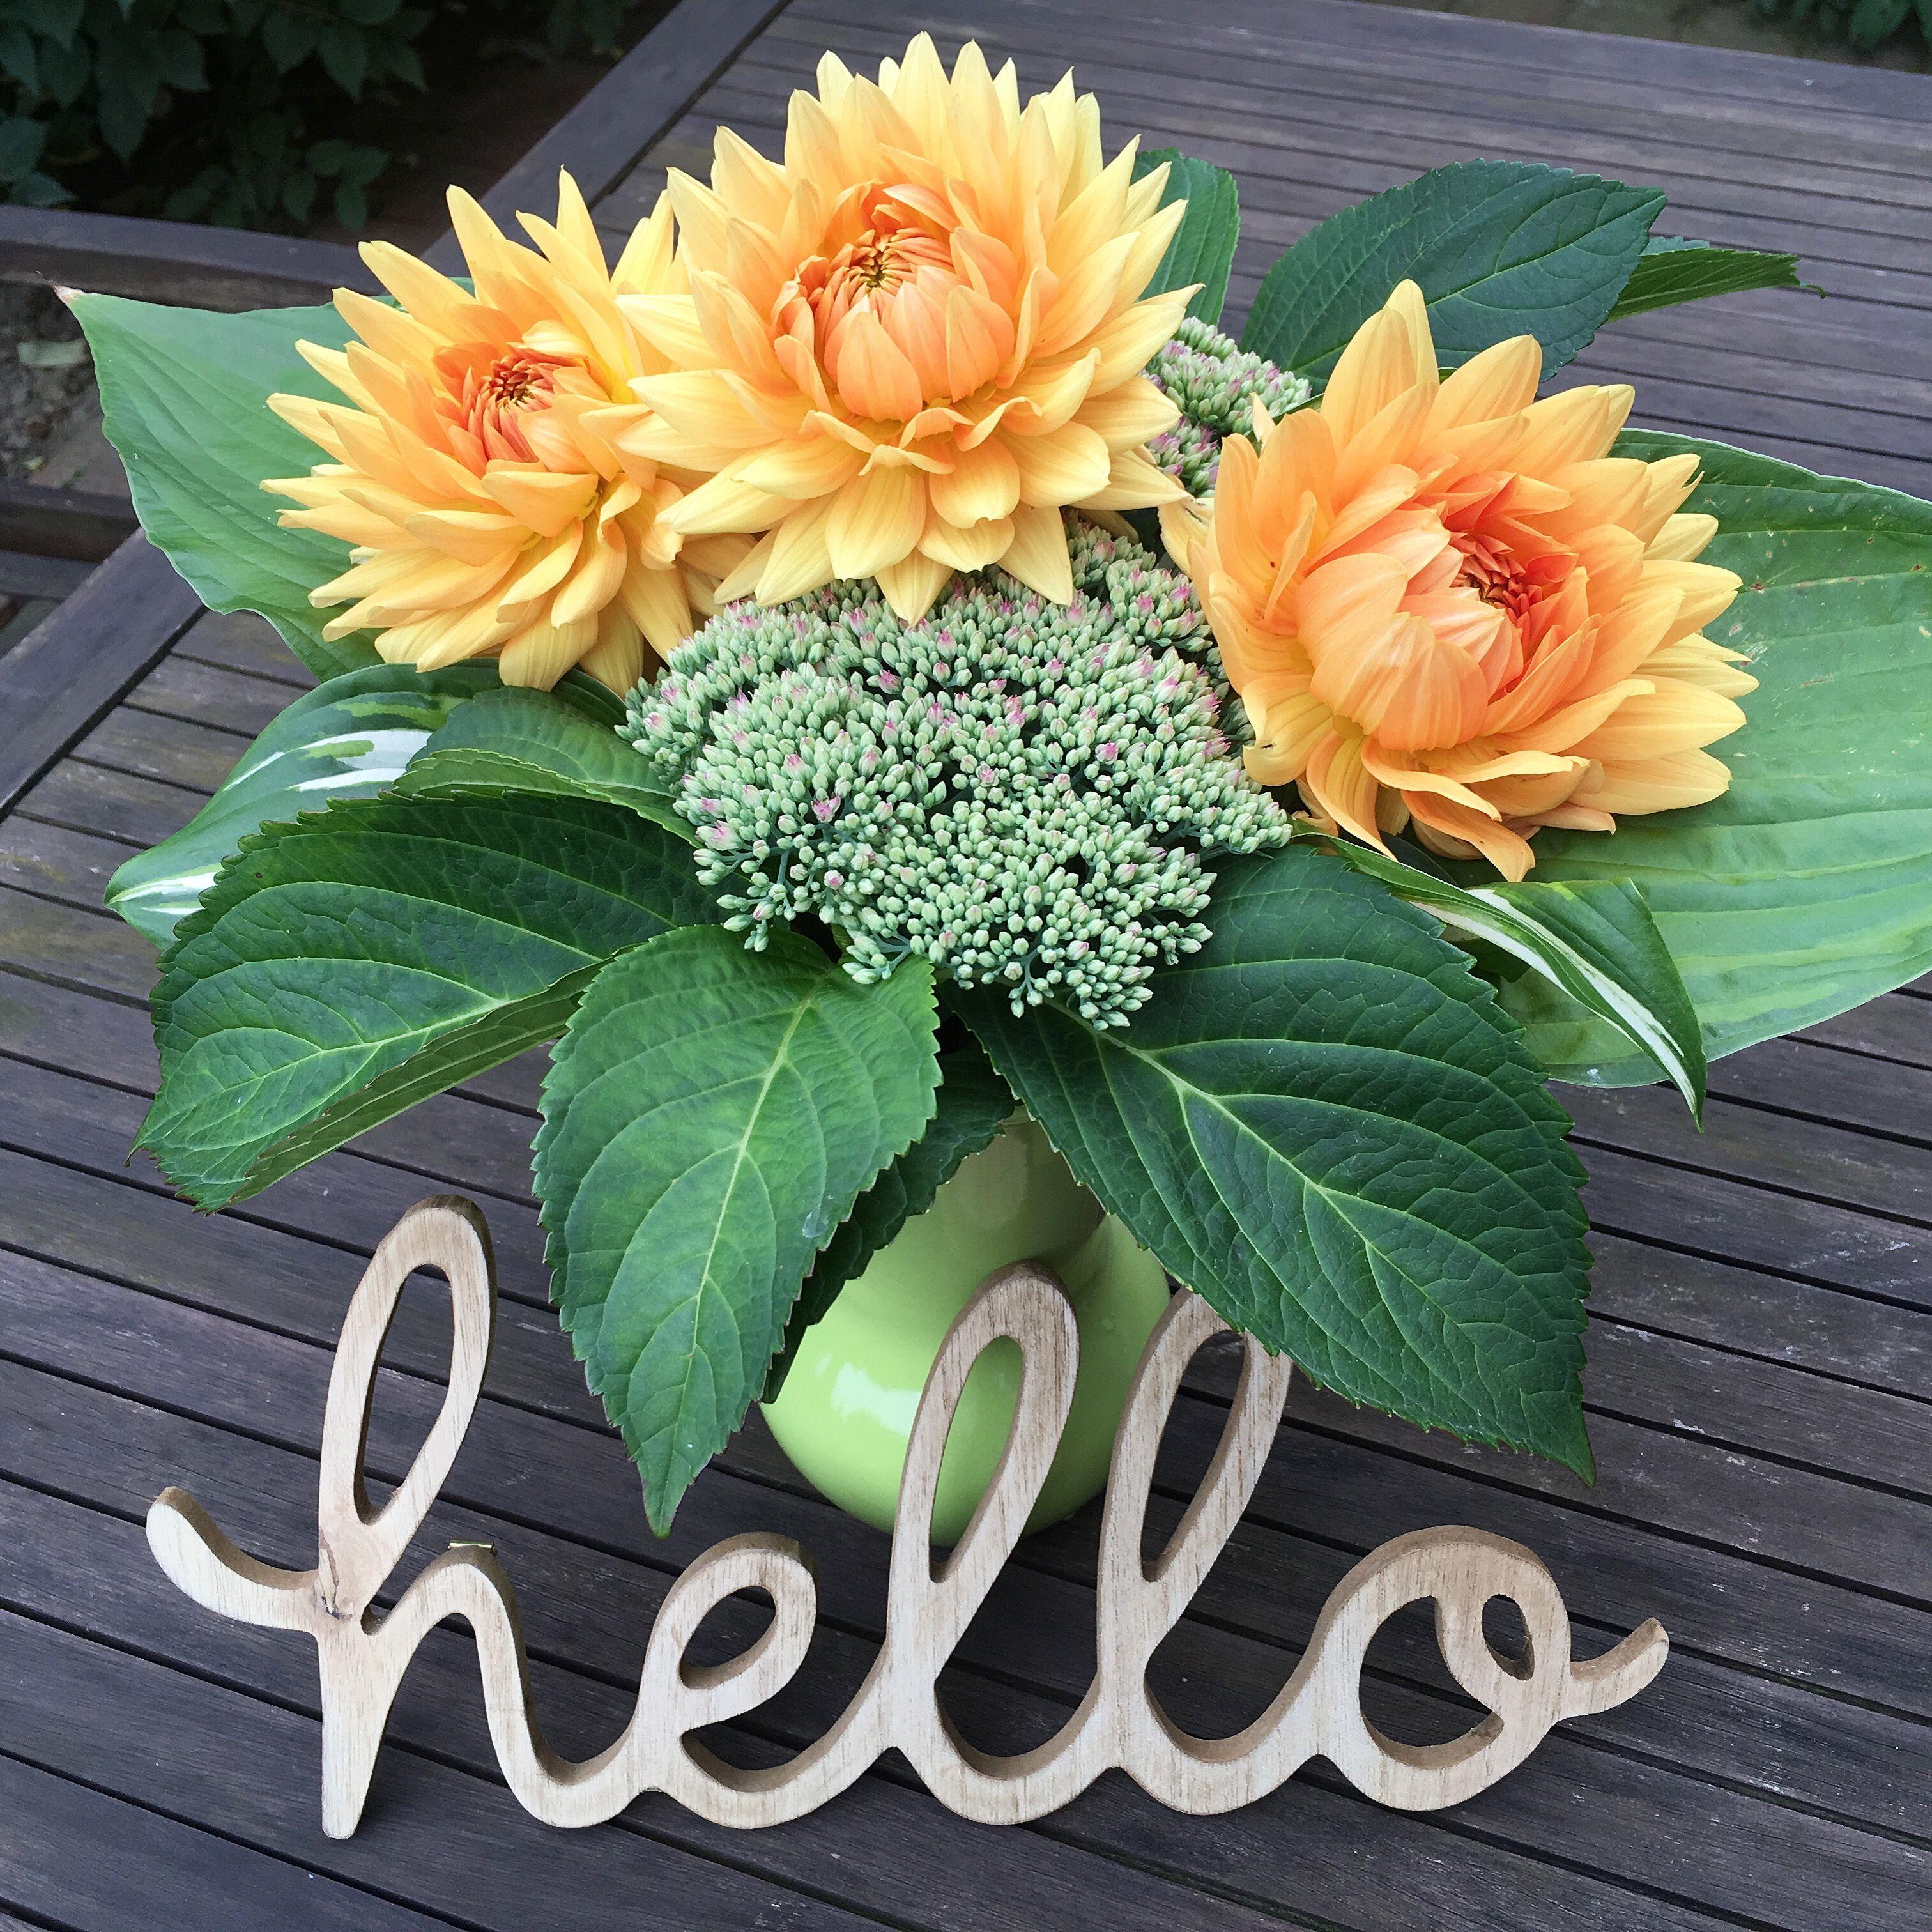 Gartenblumen · GartenblumenGarten Pflanzen